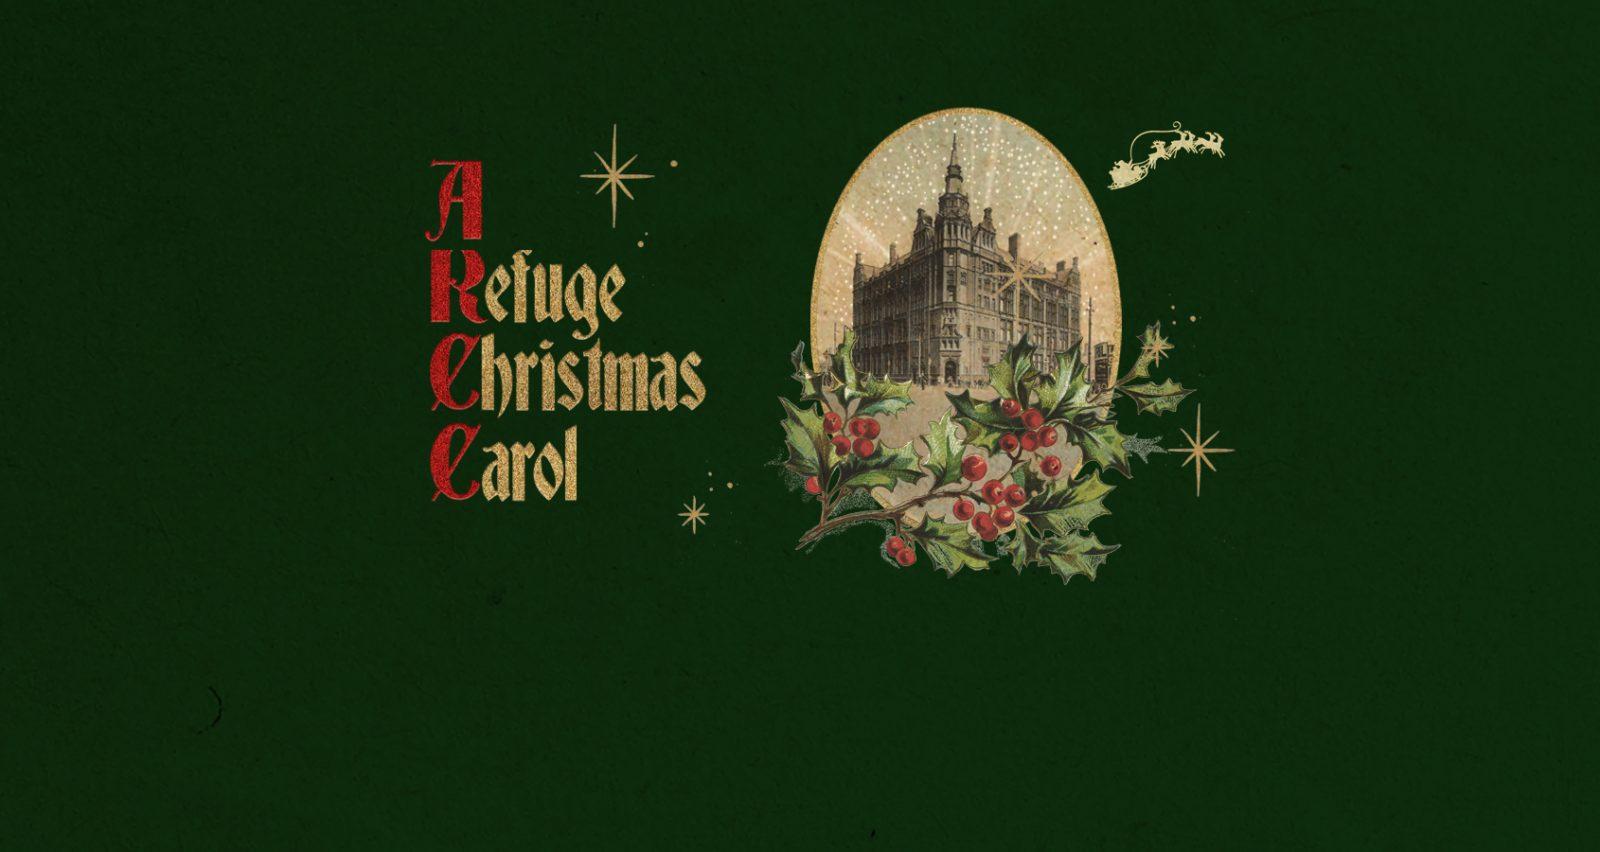 Refuge Christmas Carol